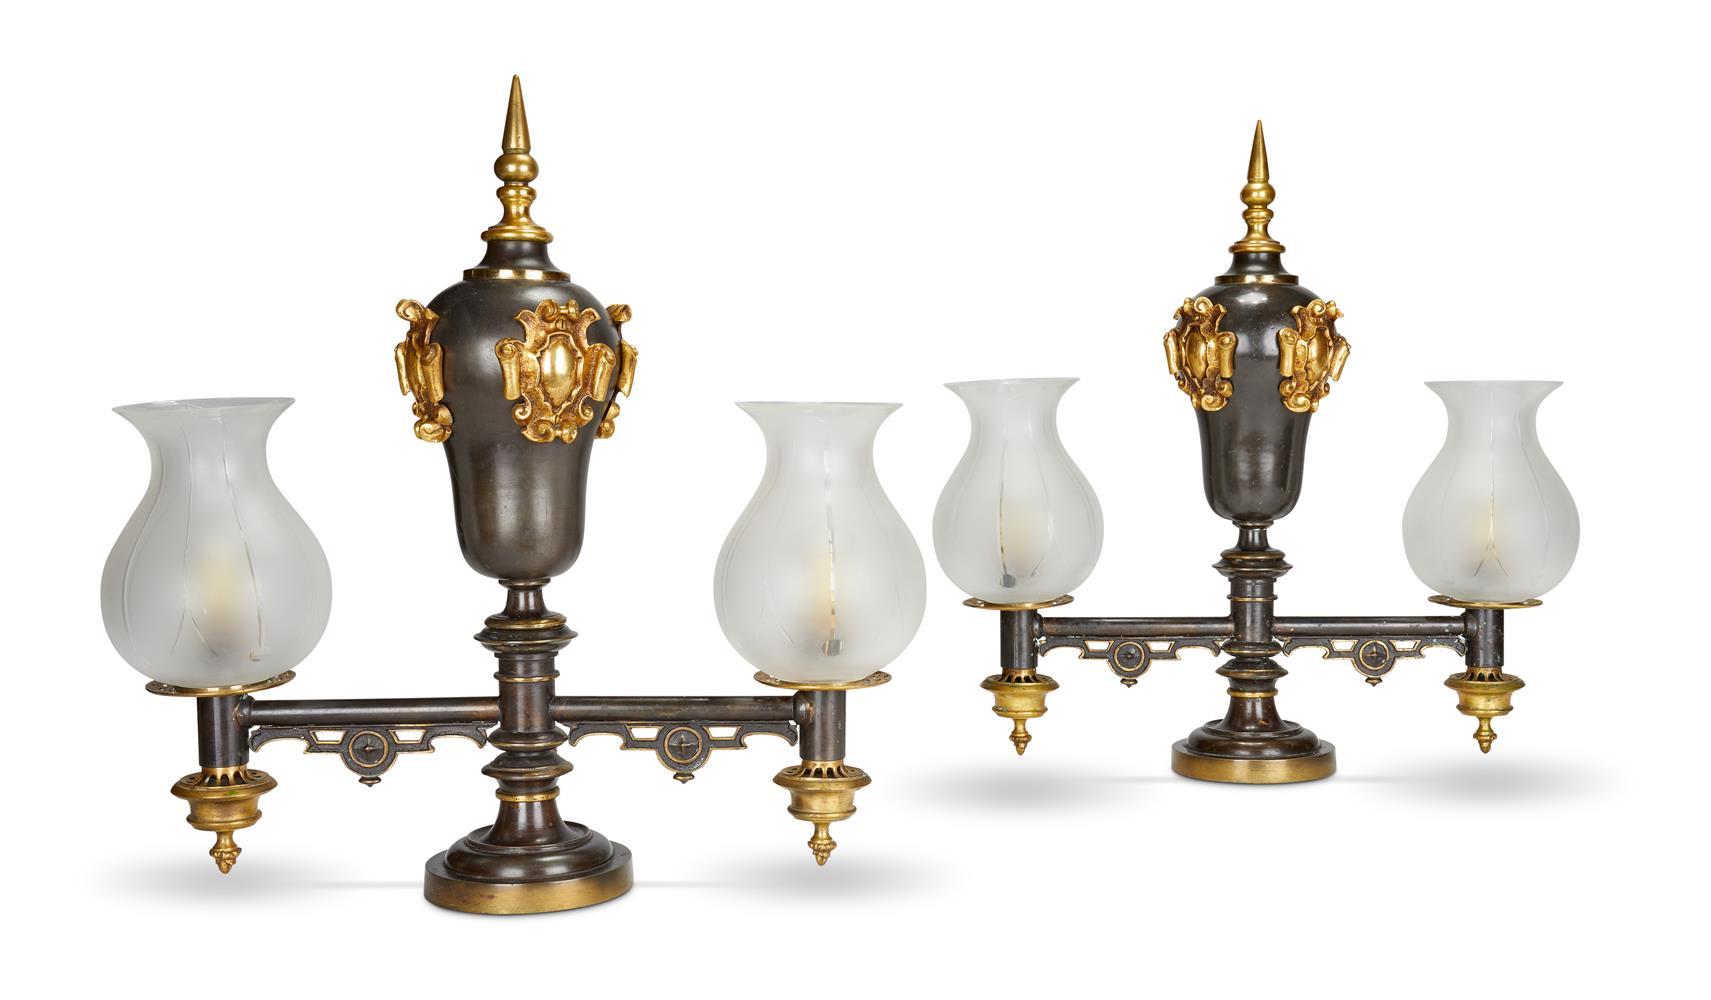 A PAIR OF PATINATED METAL ARGAND LAMPS, CIRCA 1825 - Image 2 of 2